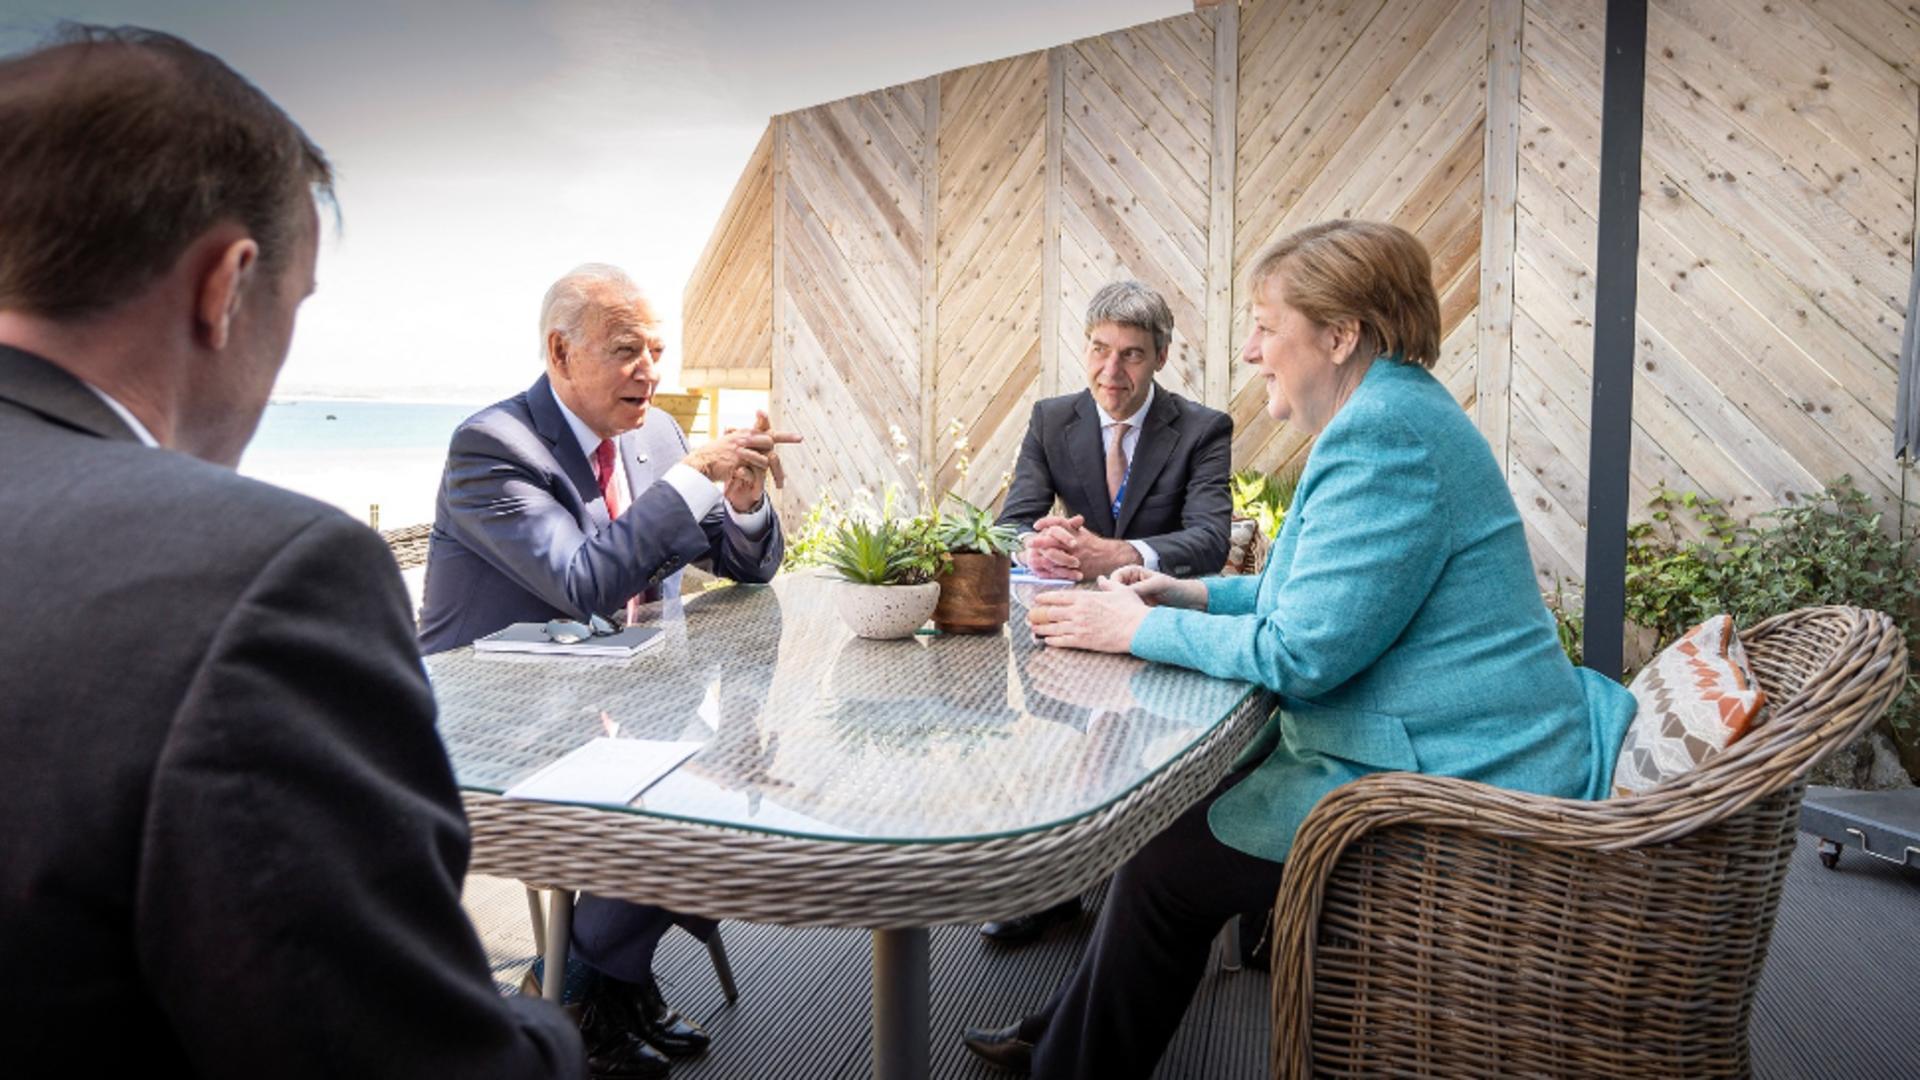 Întâlnire Merkel - Biden (FOTO: Profi Media)